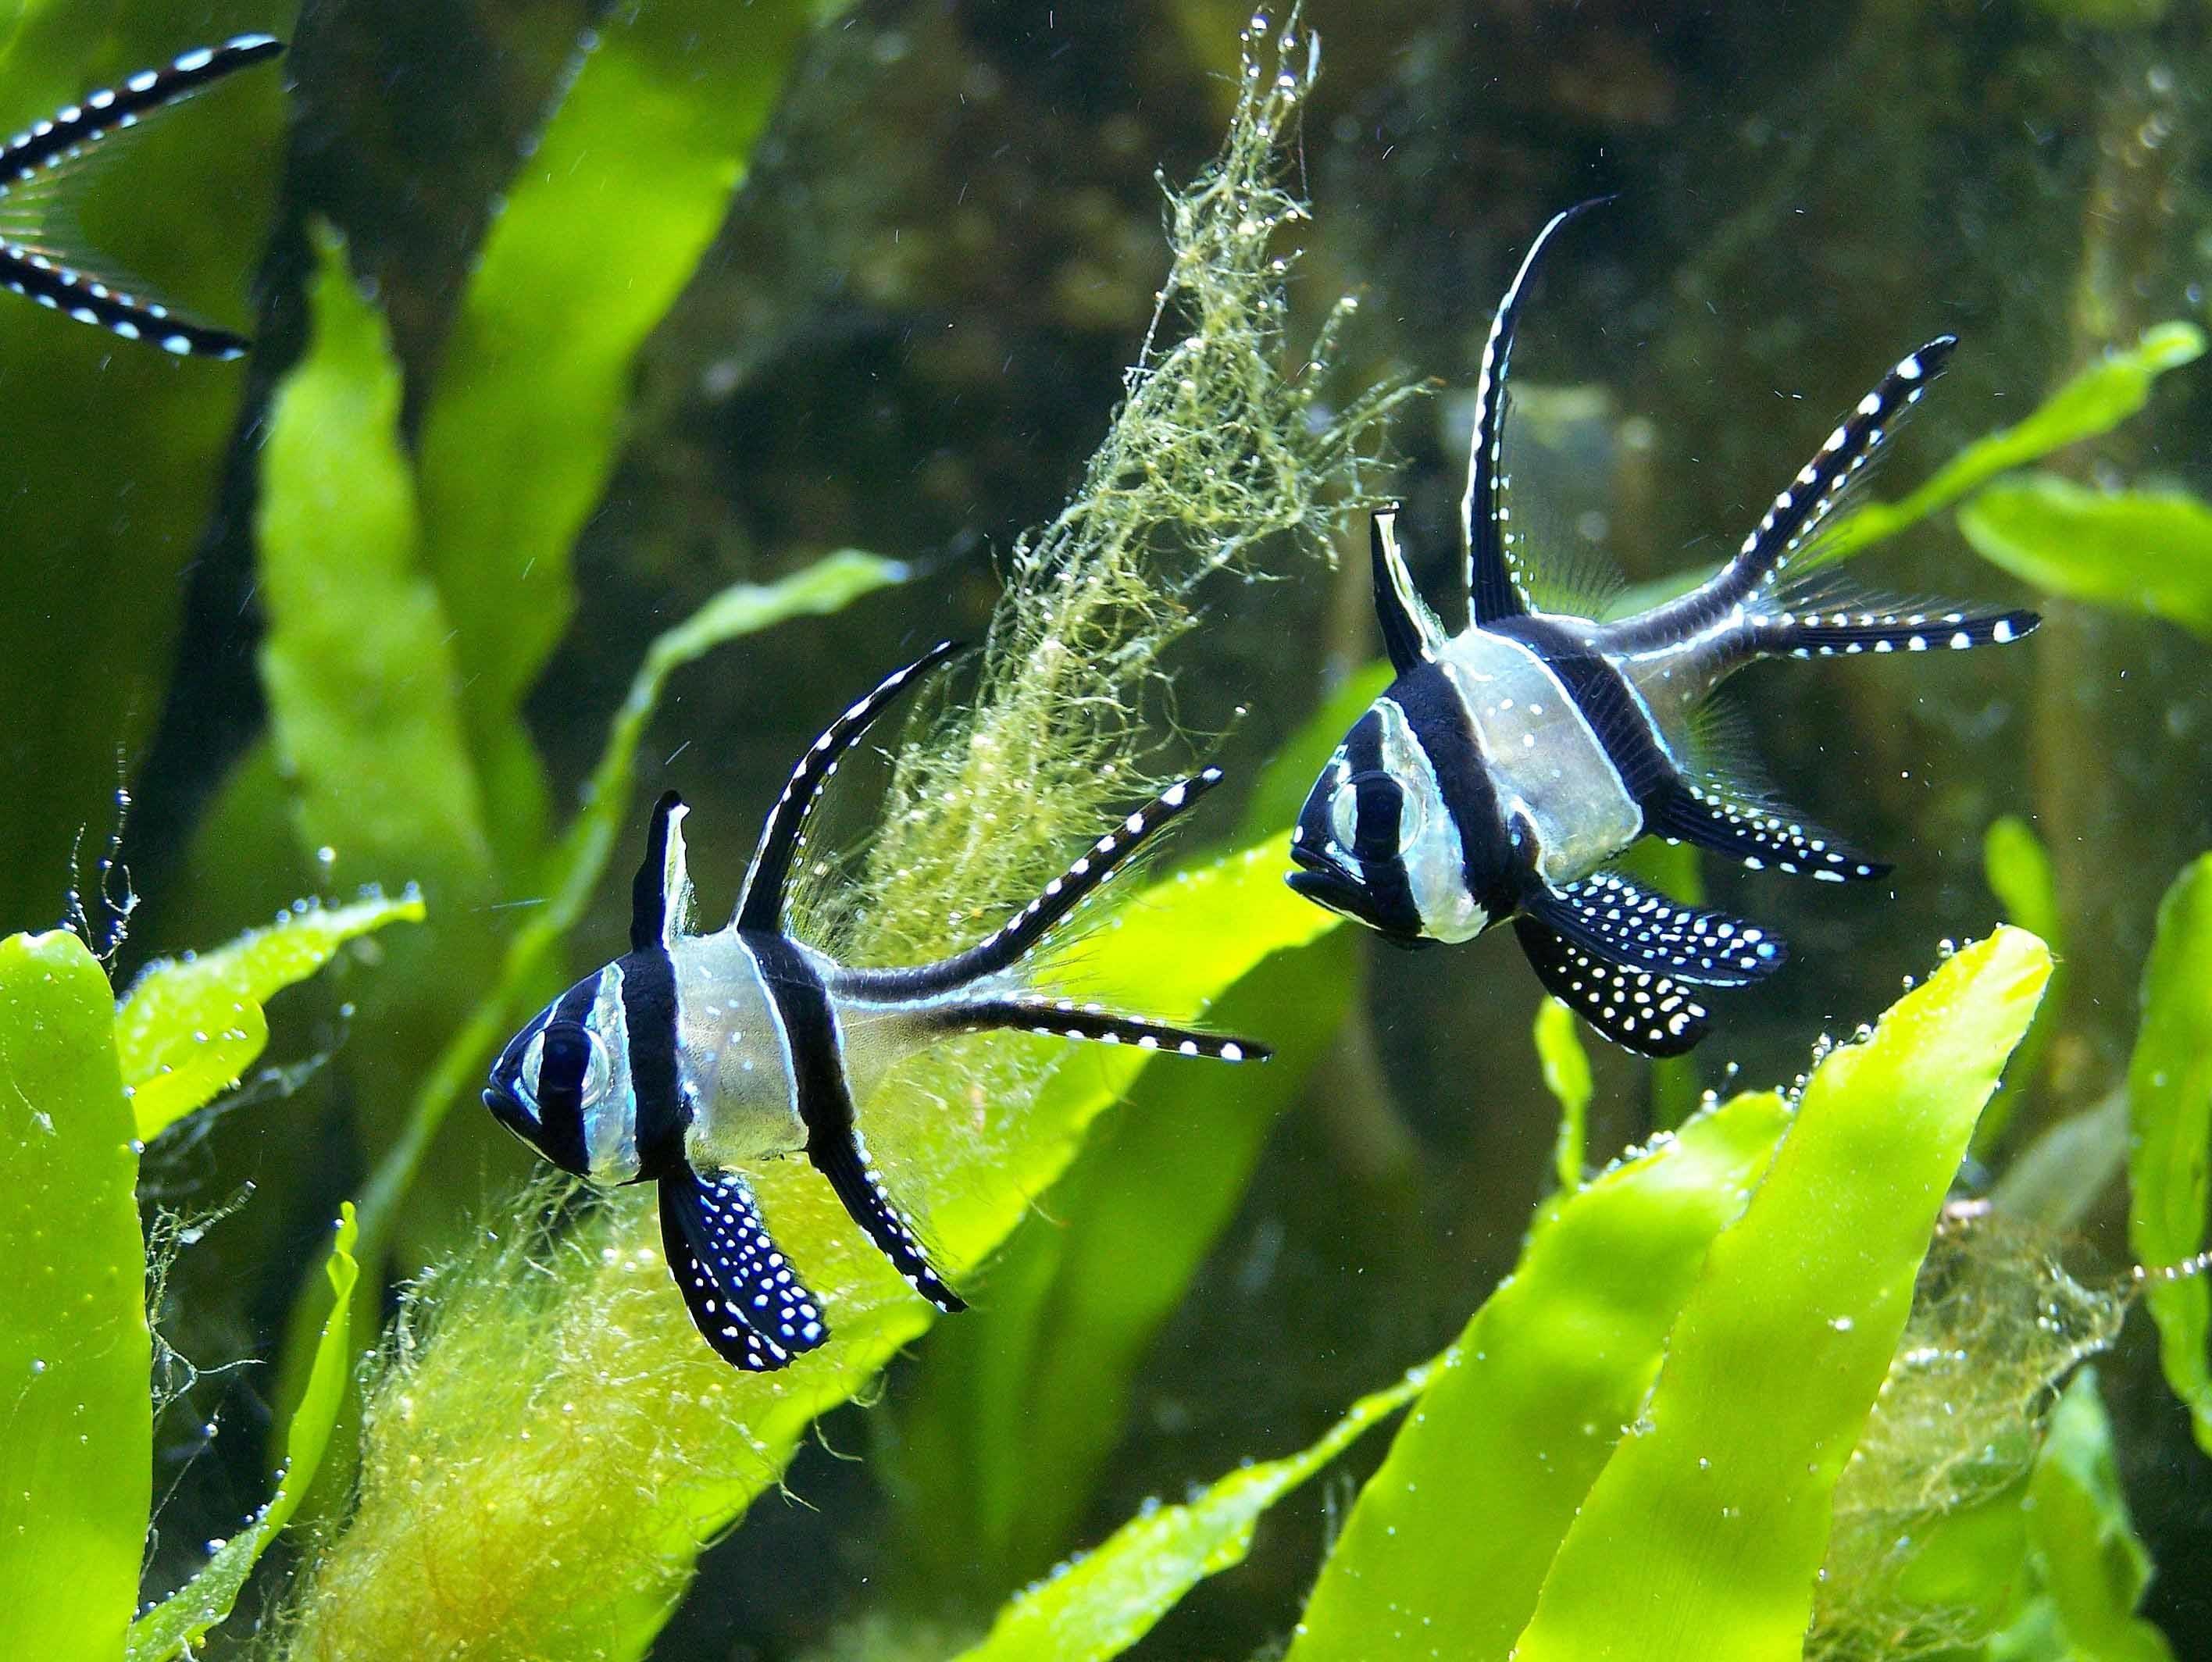 Aquarium Wallpaper Free Download For Pc : Beautiful fish photos colorful  exotic fish wallpapers